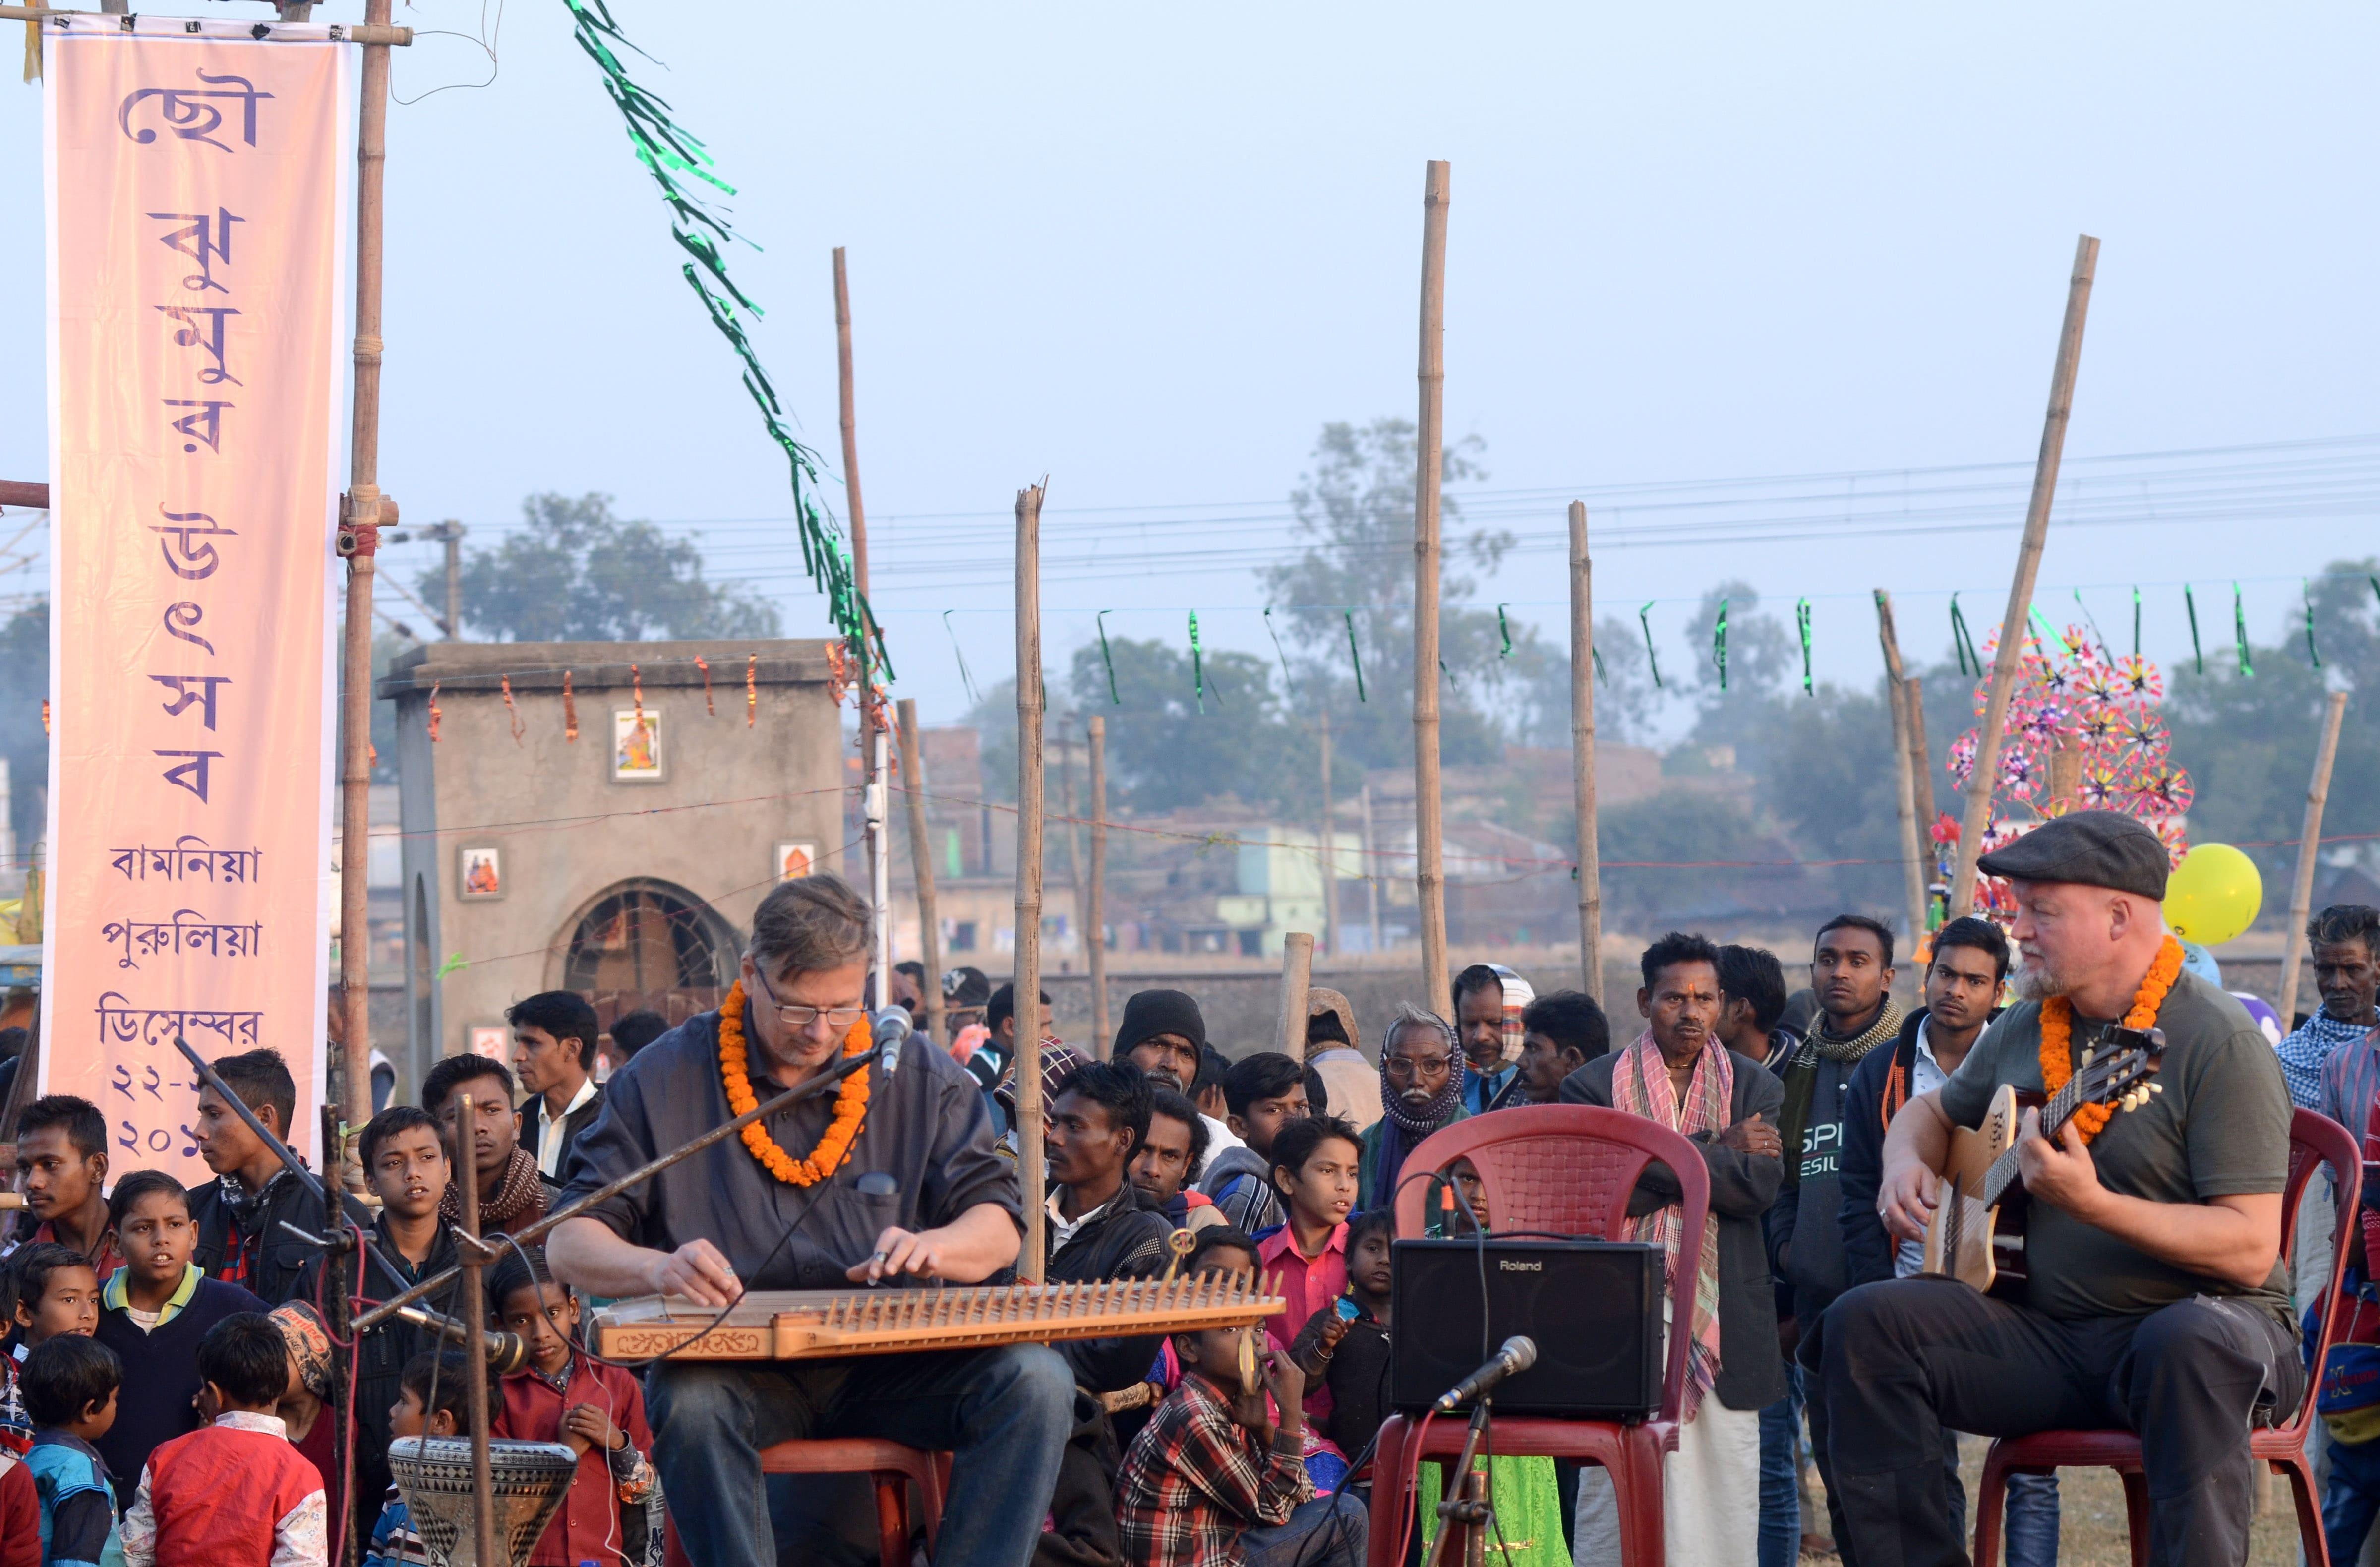 Chau Jhumur Utsav 2018